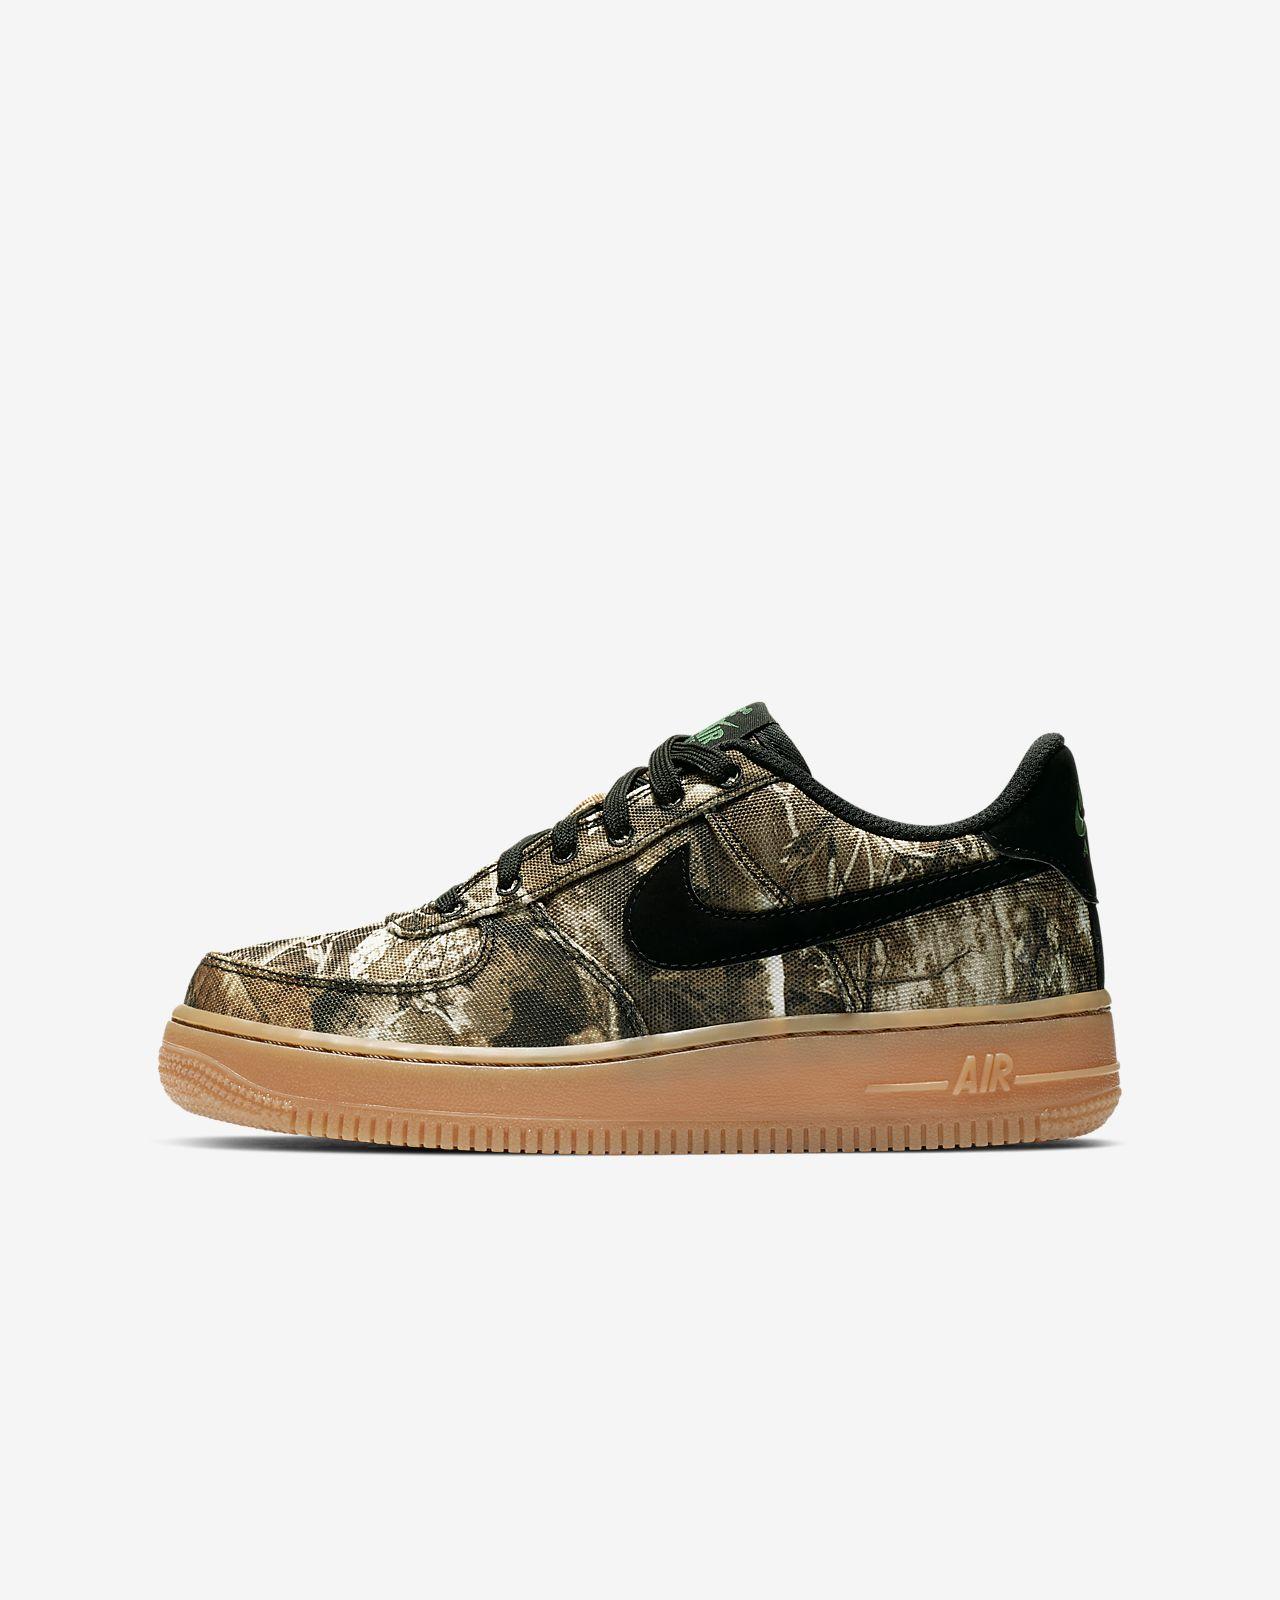 Nike Air Force 1 LV8 3 Big Kids' Shoe